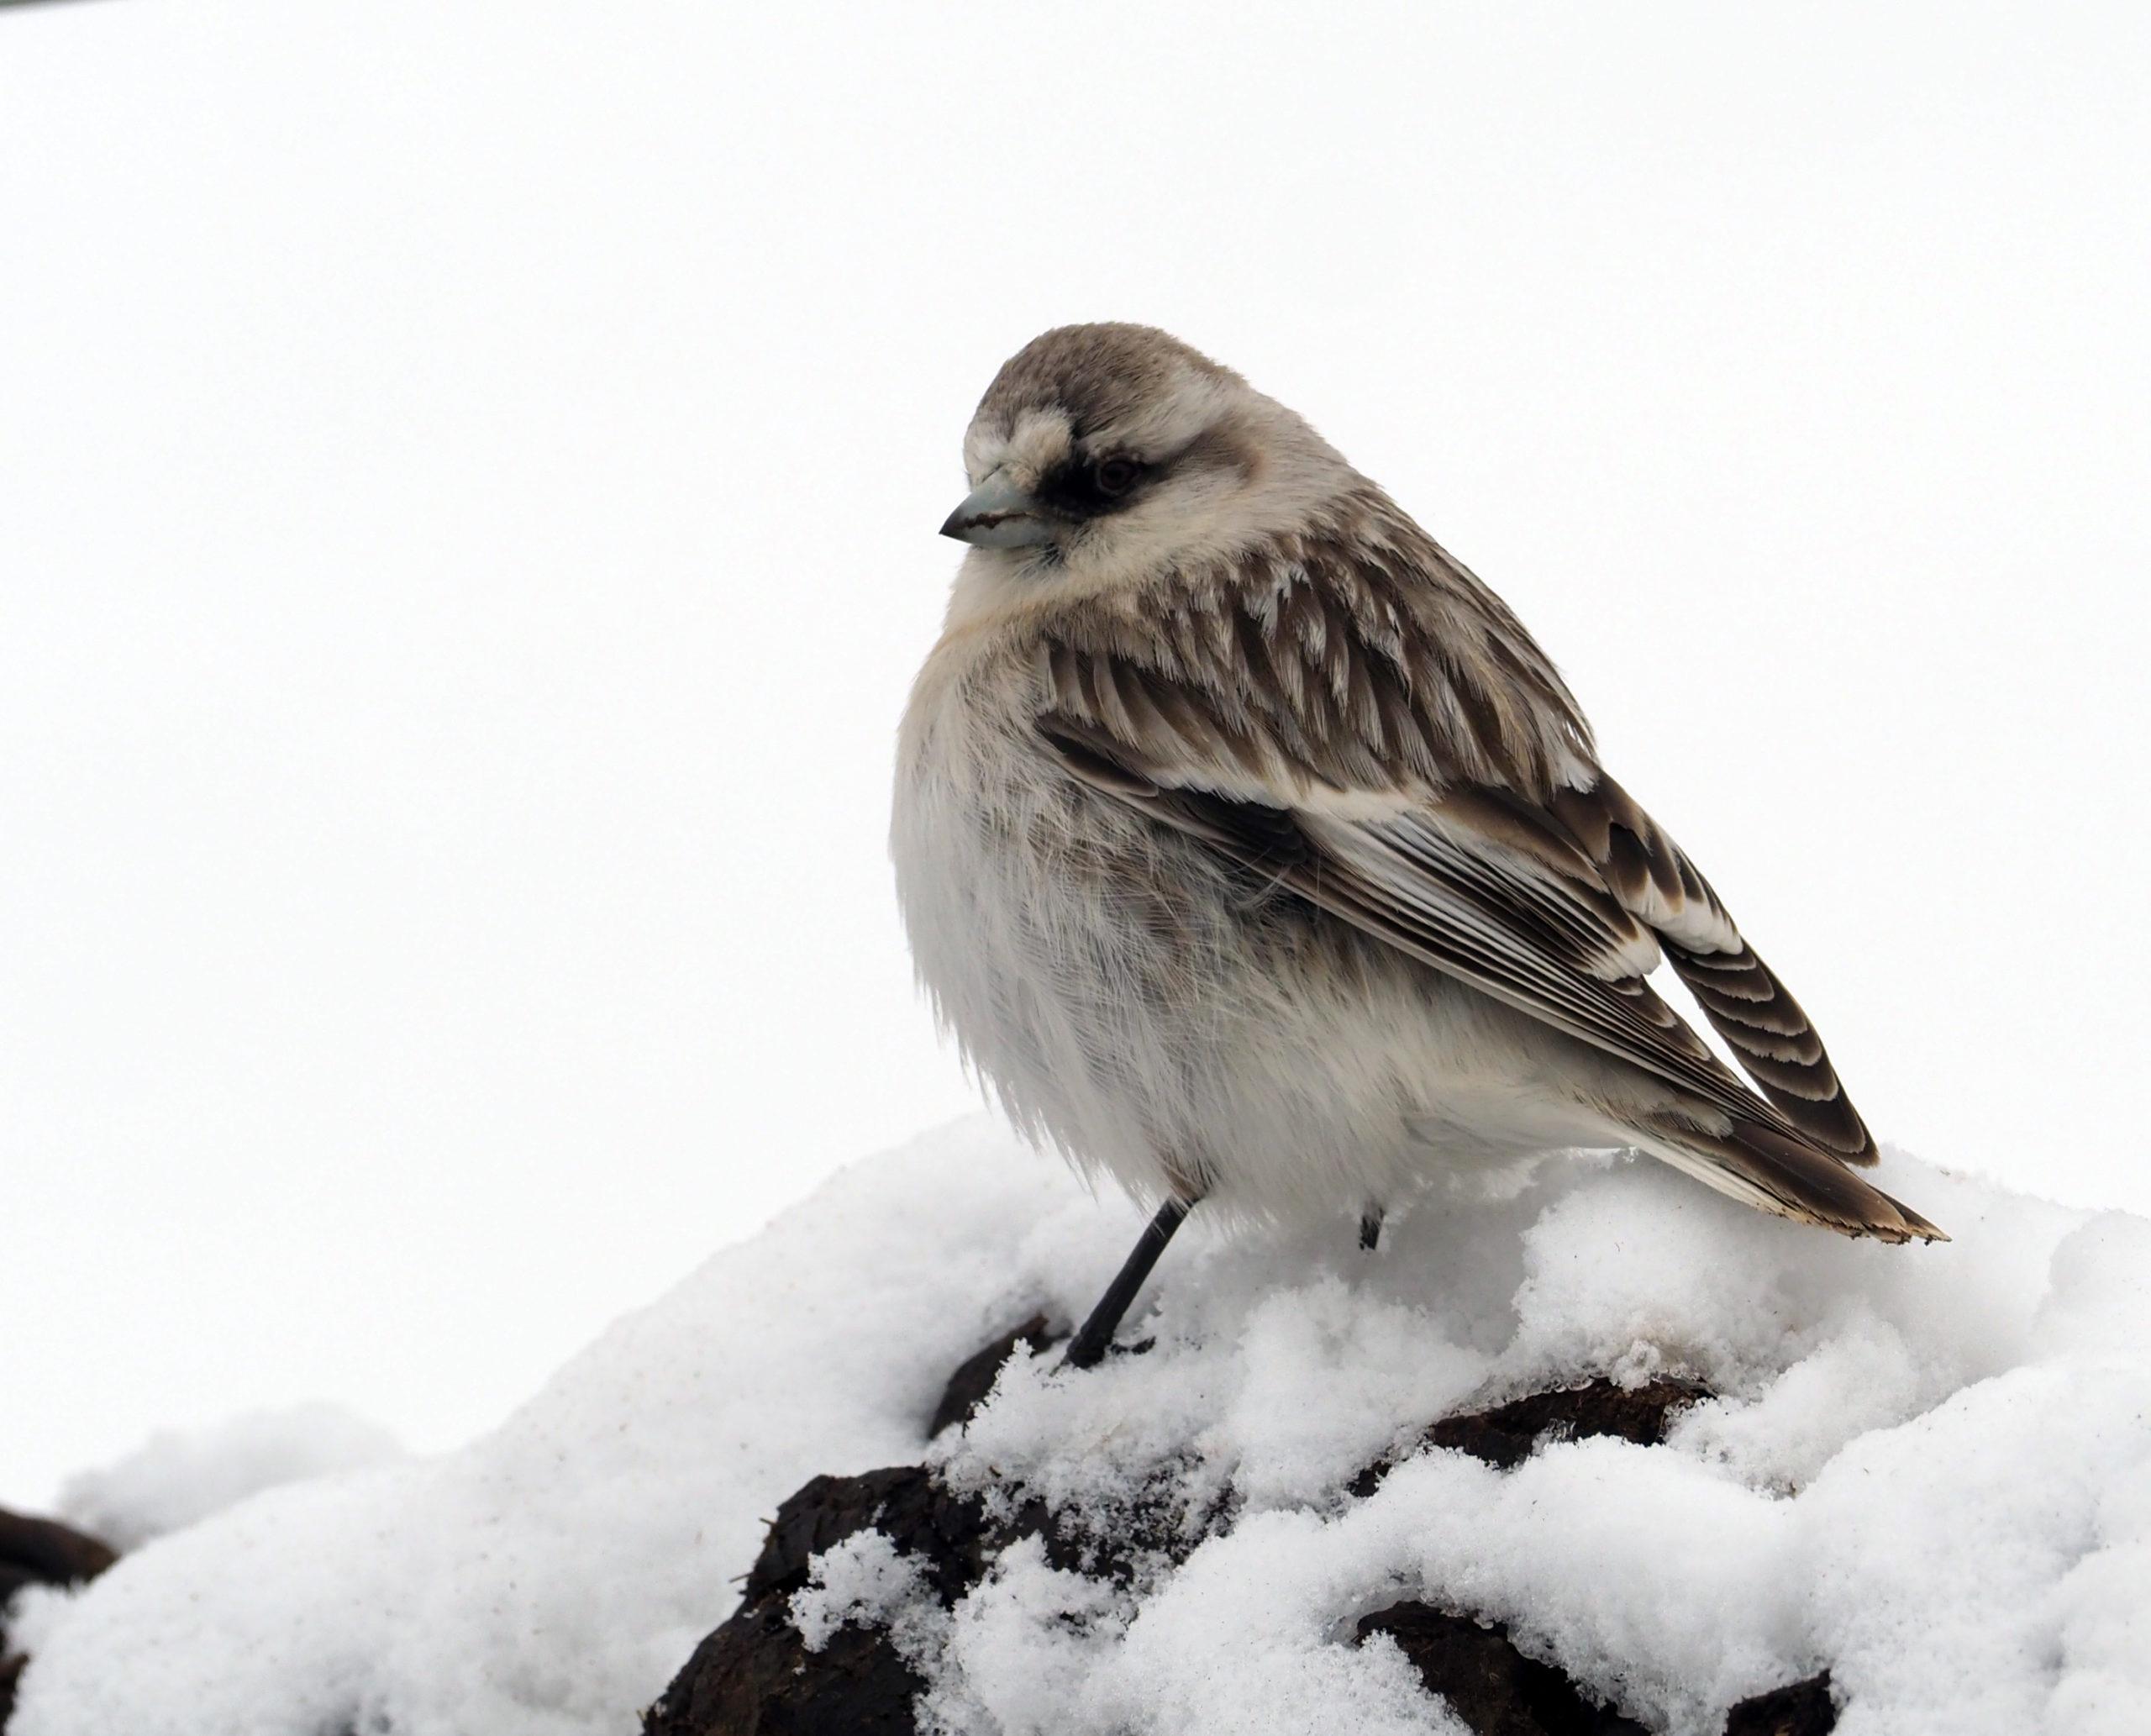 Birds in snow leopard habitats